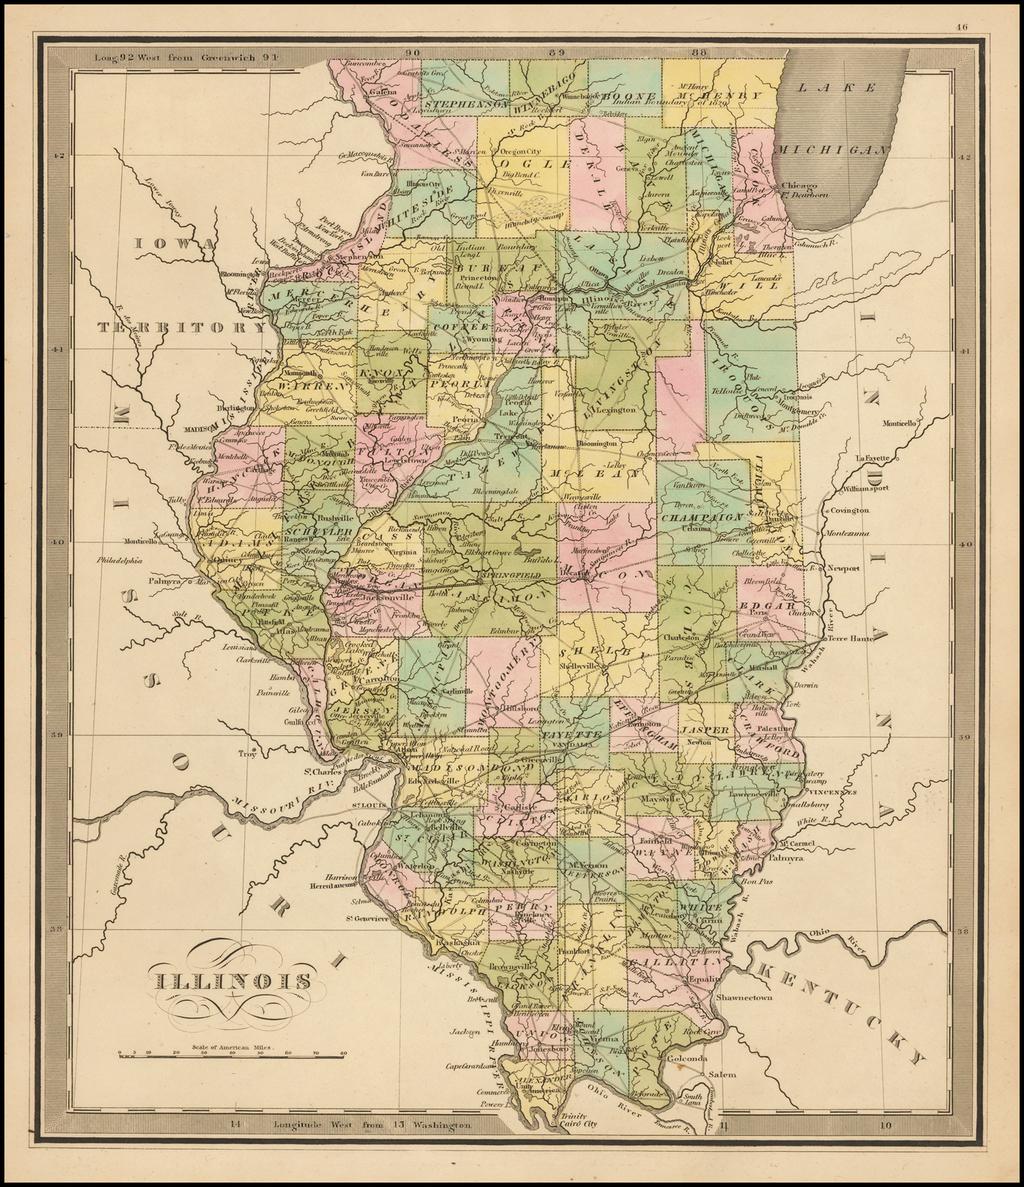 Illinois By Jeremiah Greenleaf